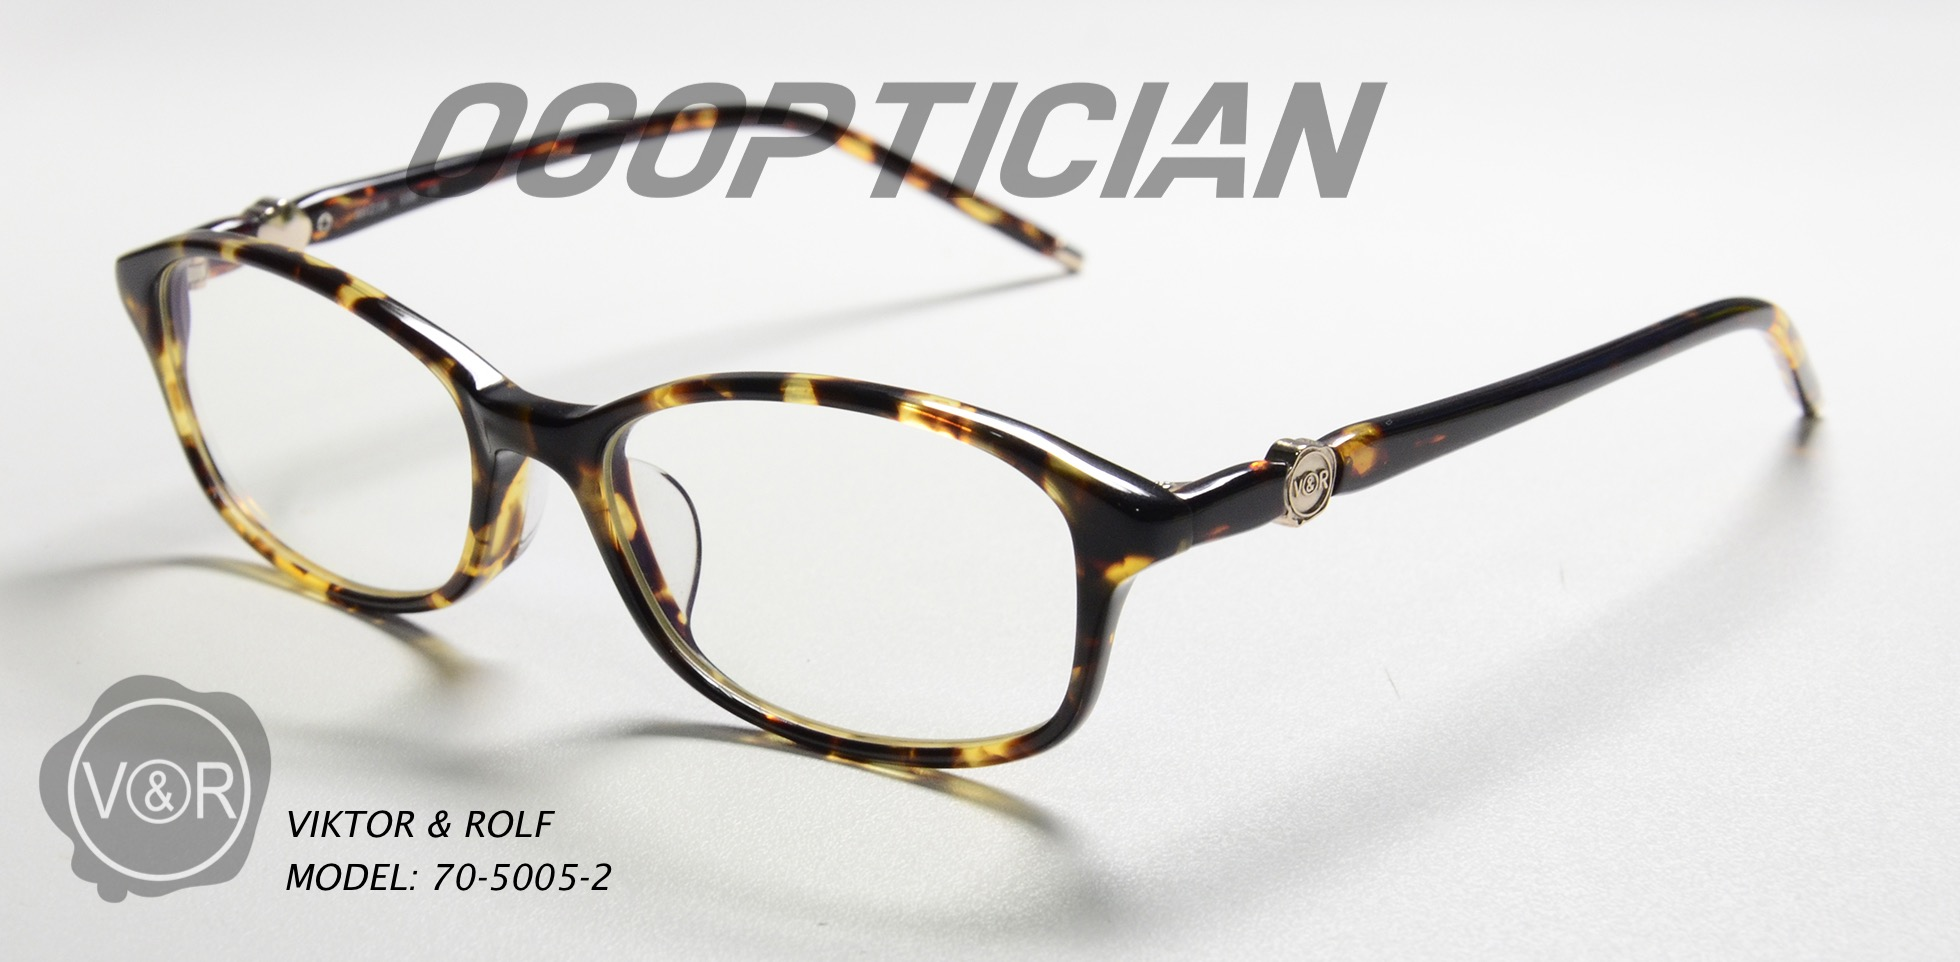 VIKTORANDROLF 70-5005-2